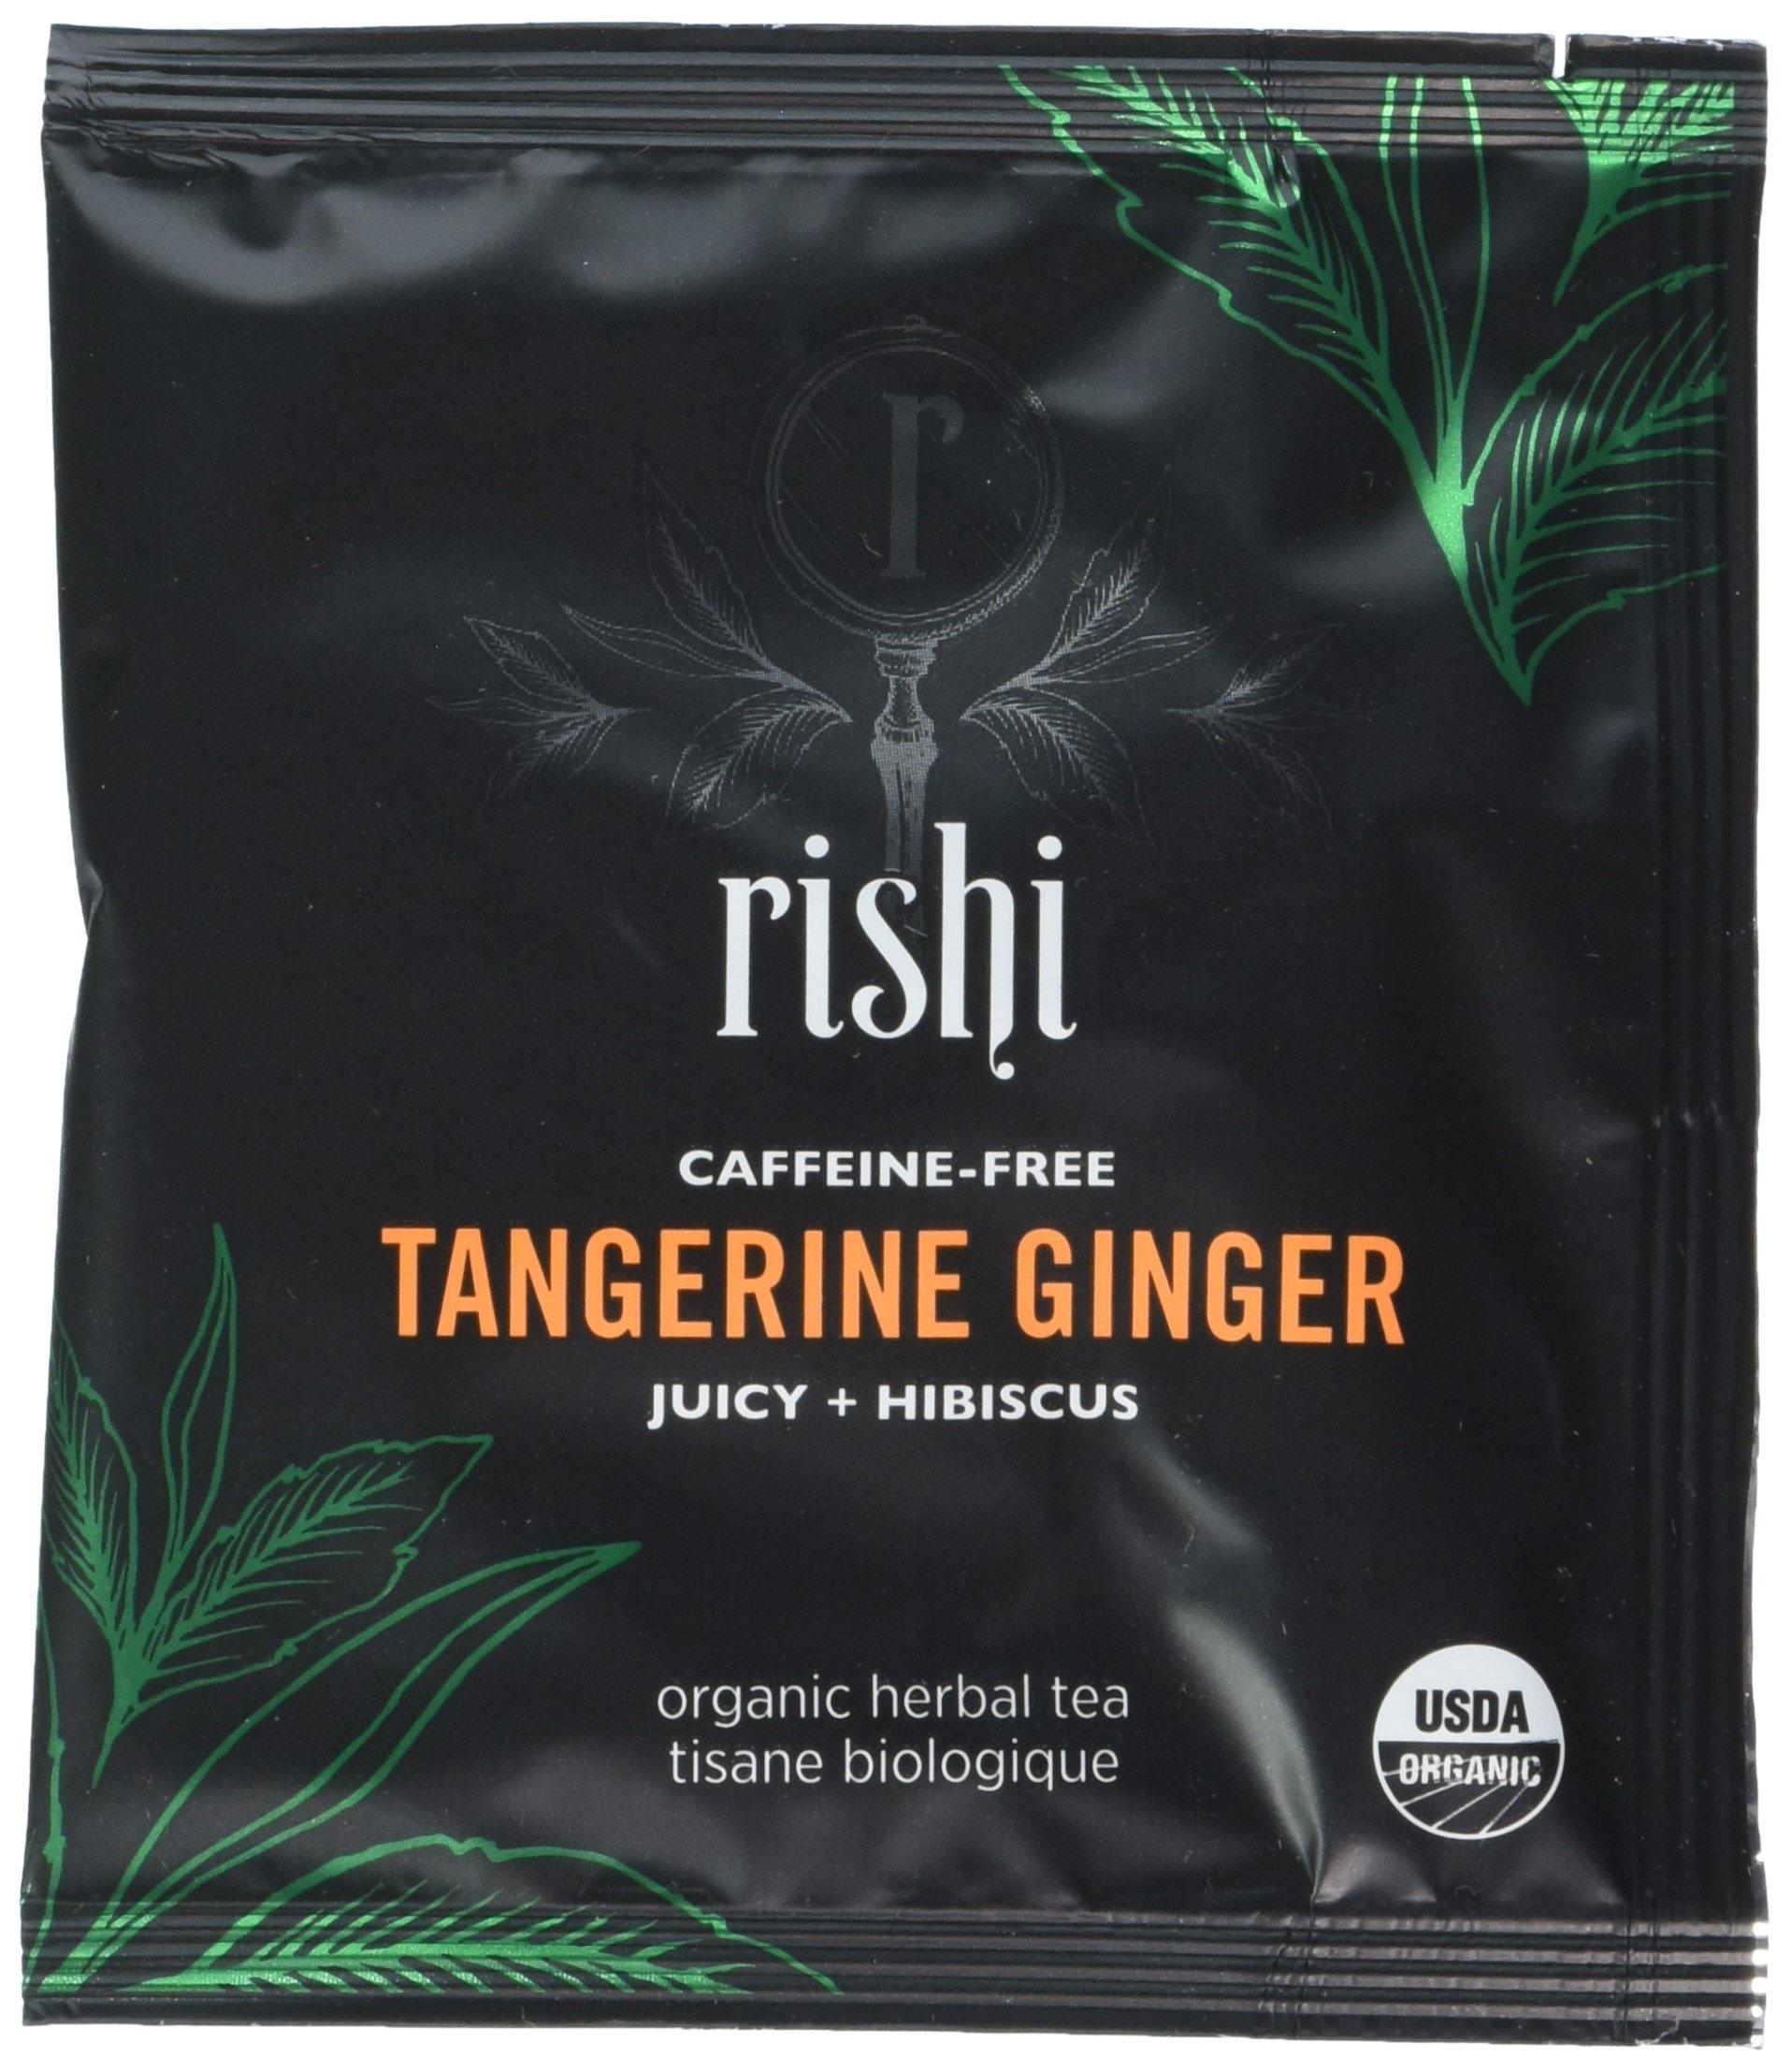 Rishi Tea Ginger Tea Bags, Organic Tangerine, 50 Count